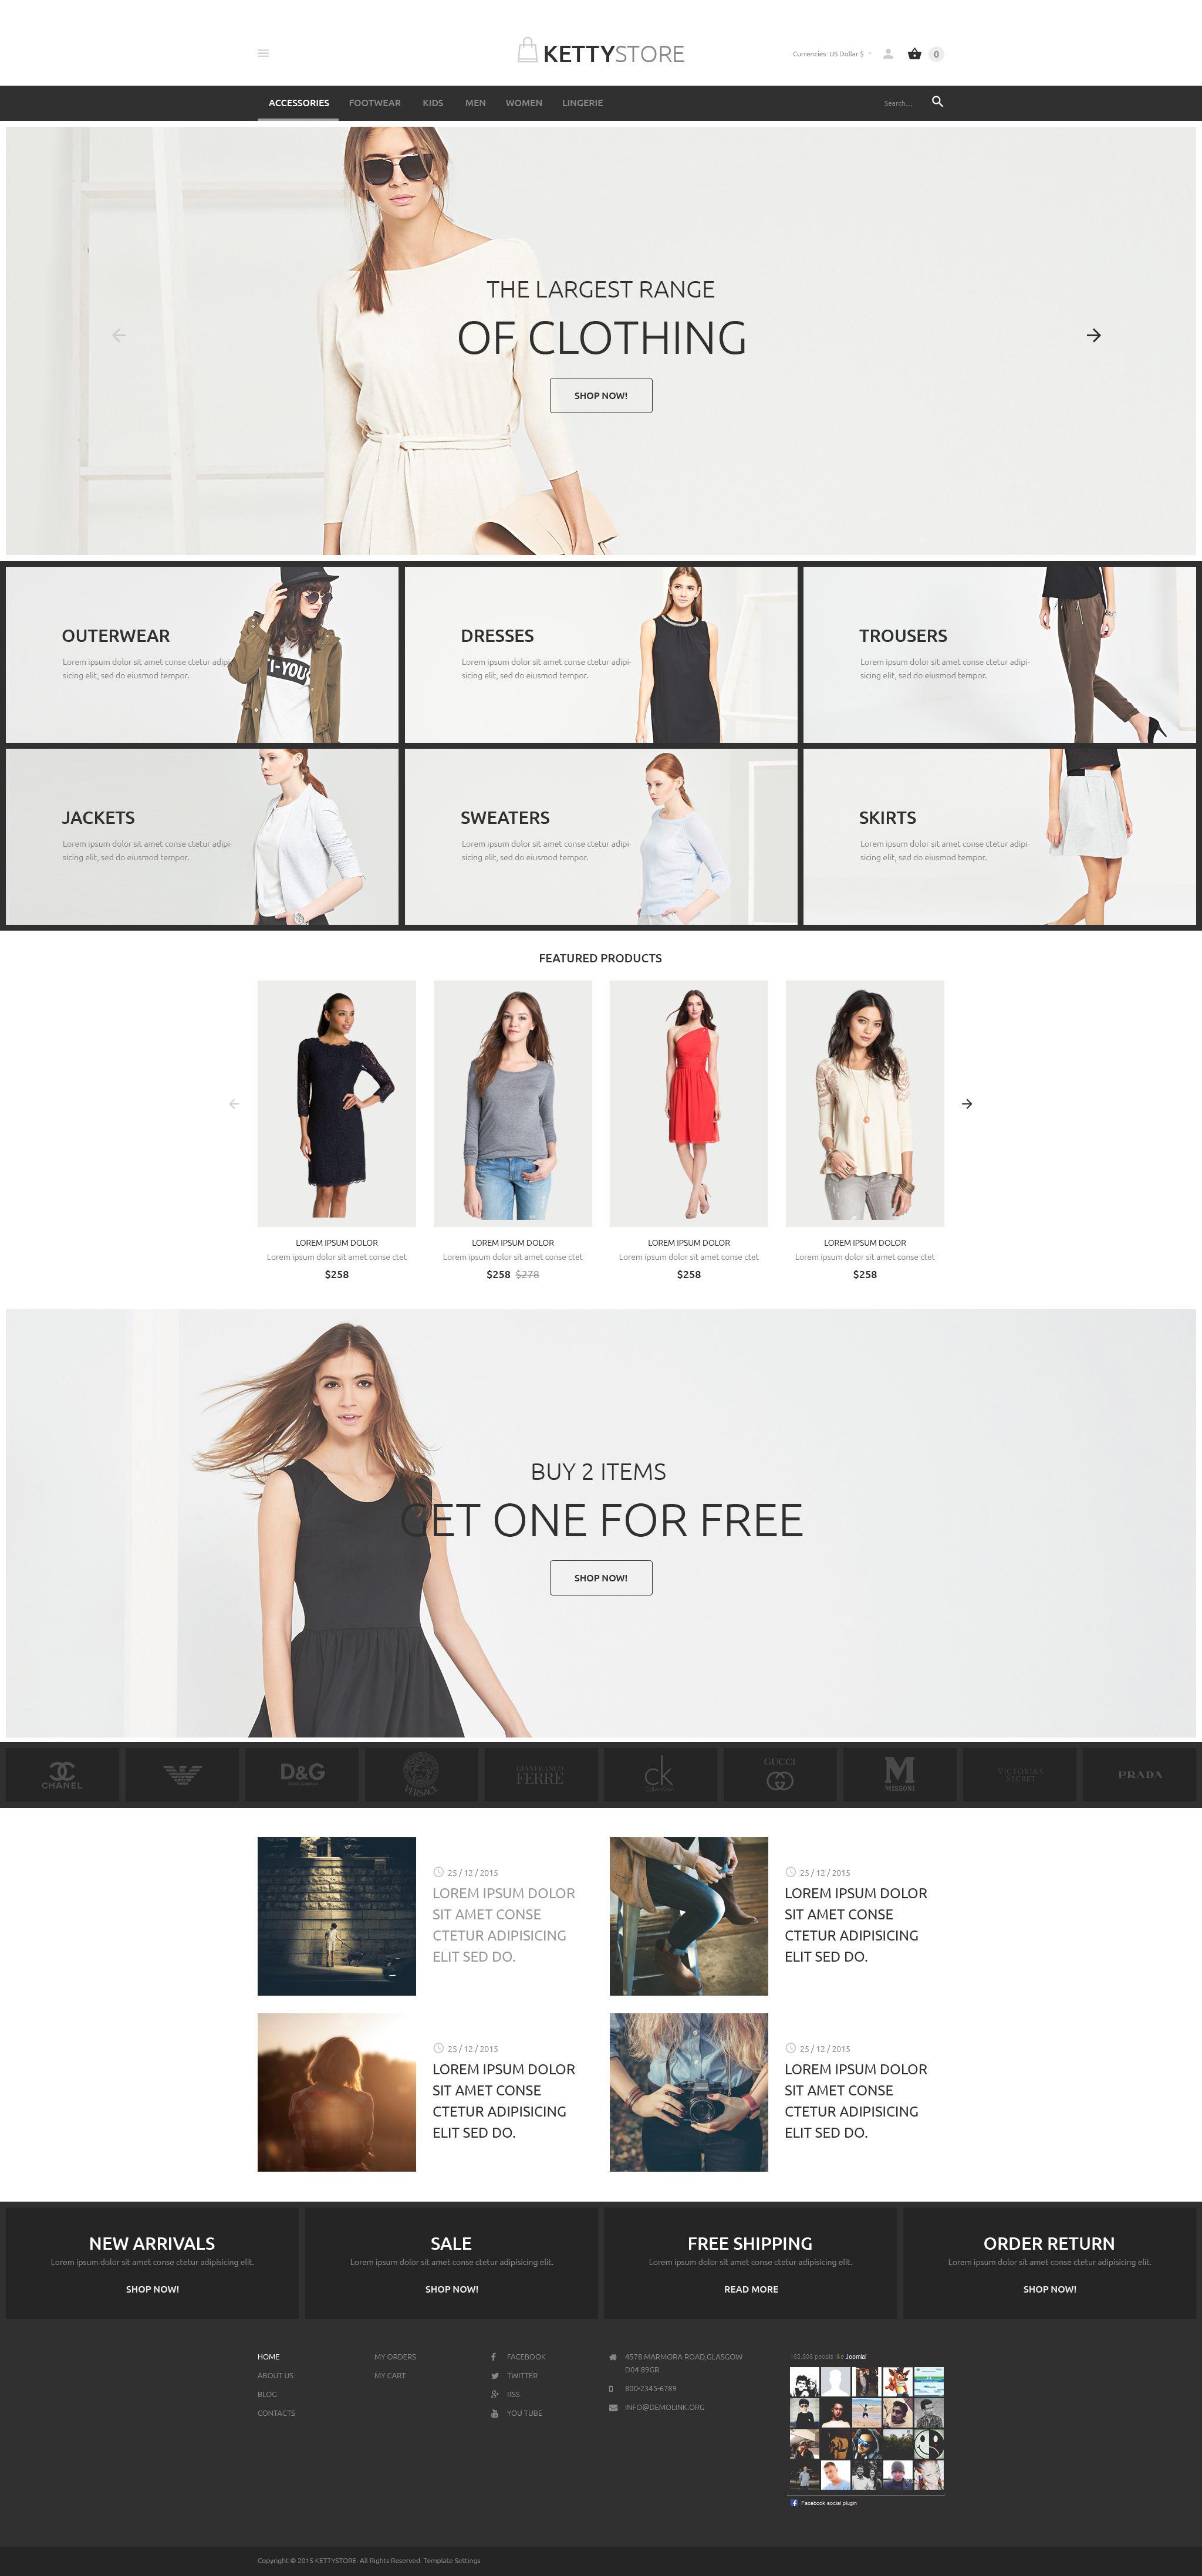 Apparel Online Store Virtuemart #54622